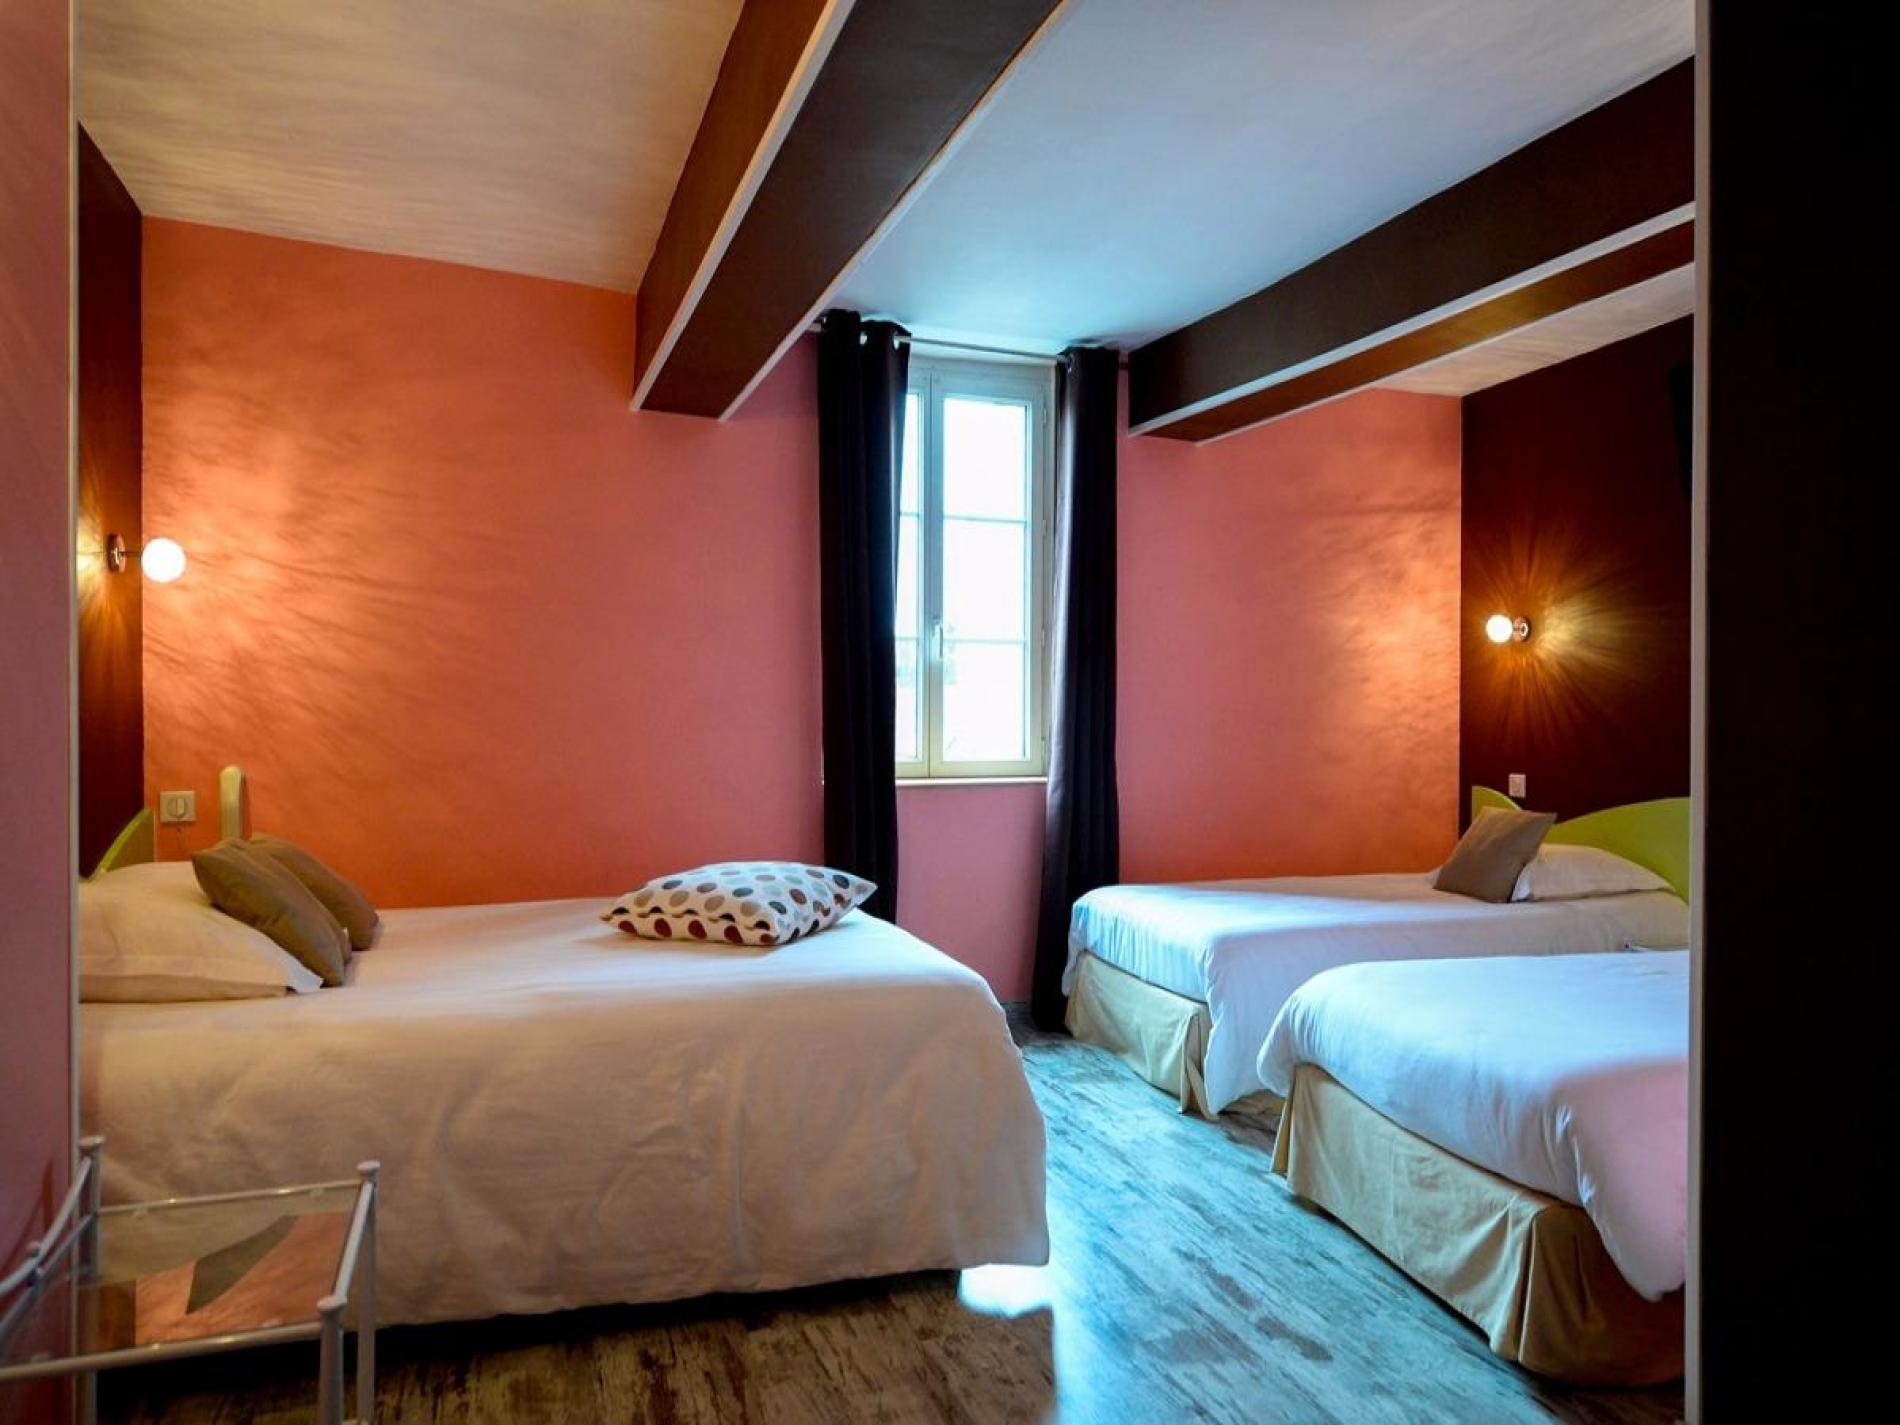 charming 2 stars hotel 30 kms from evreux at beaumont le roger. Black Bedroom Furniture Sets. Home Design Ideas